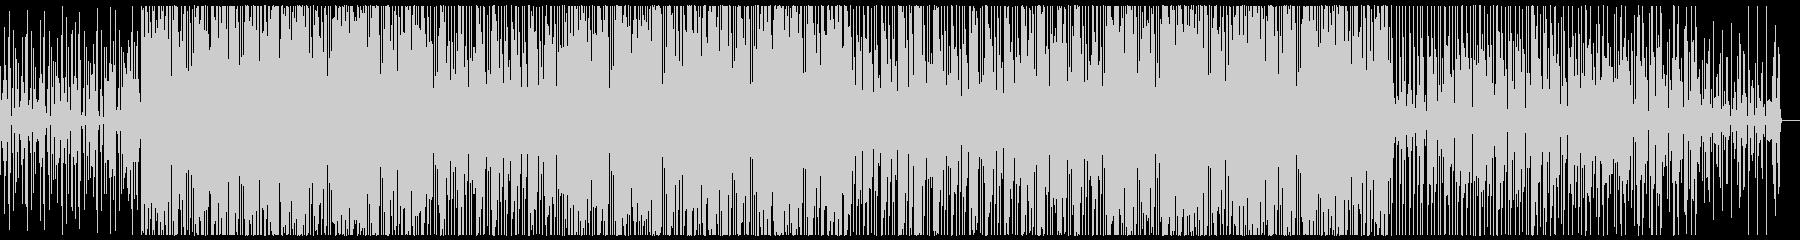 Terniの未再生の波形